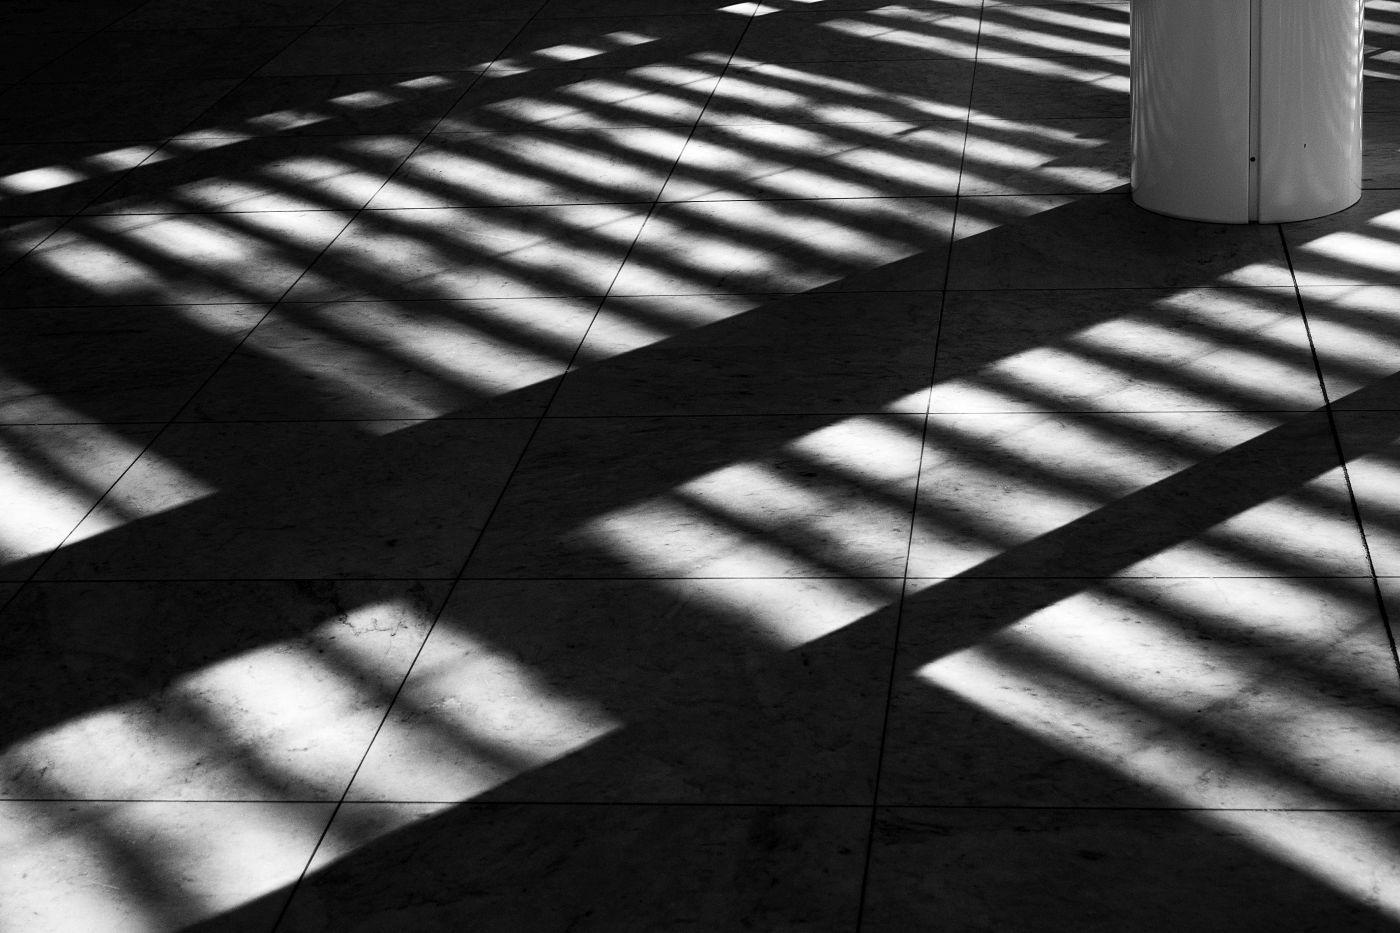 Schattenspiele #03 | © wolfgang röser | worobo